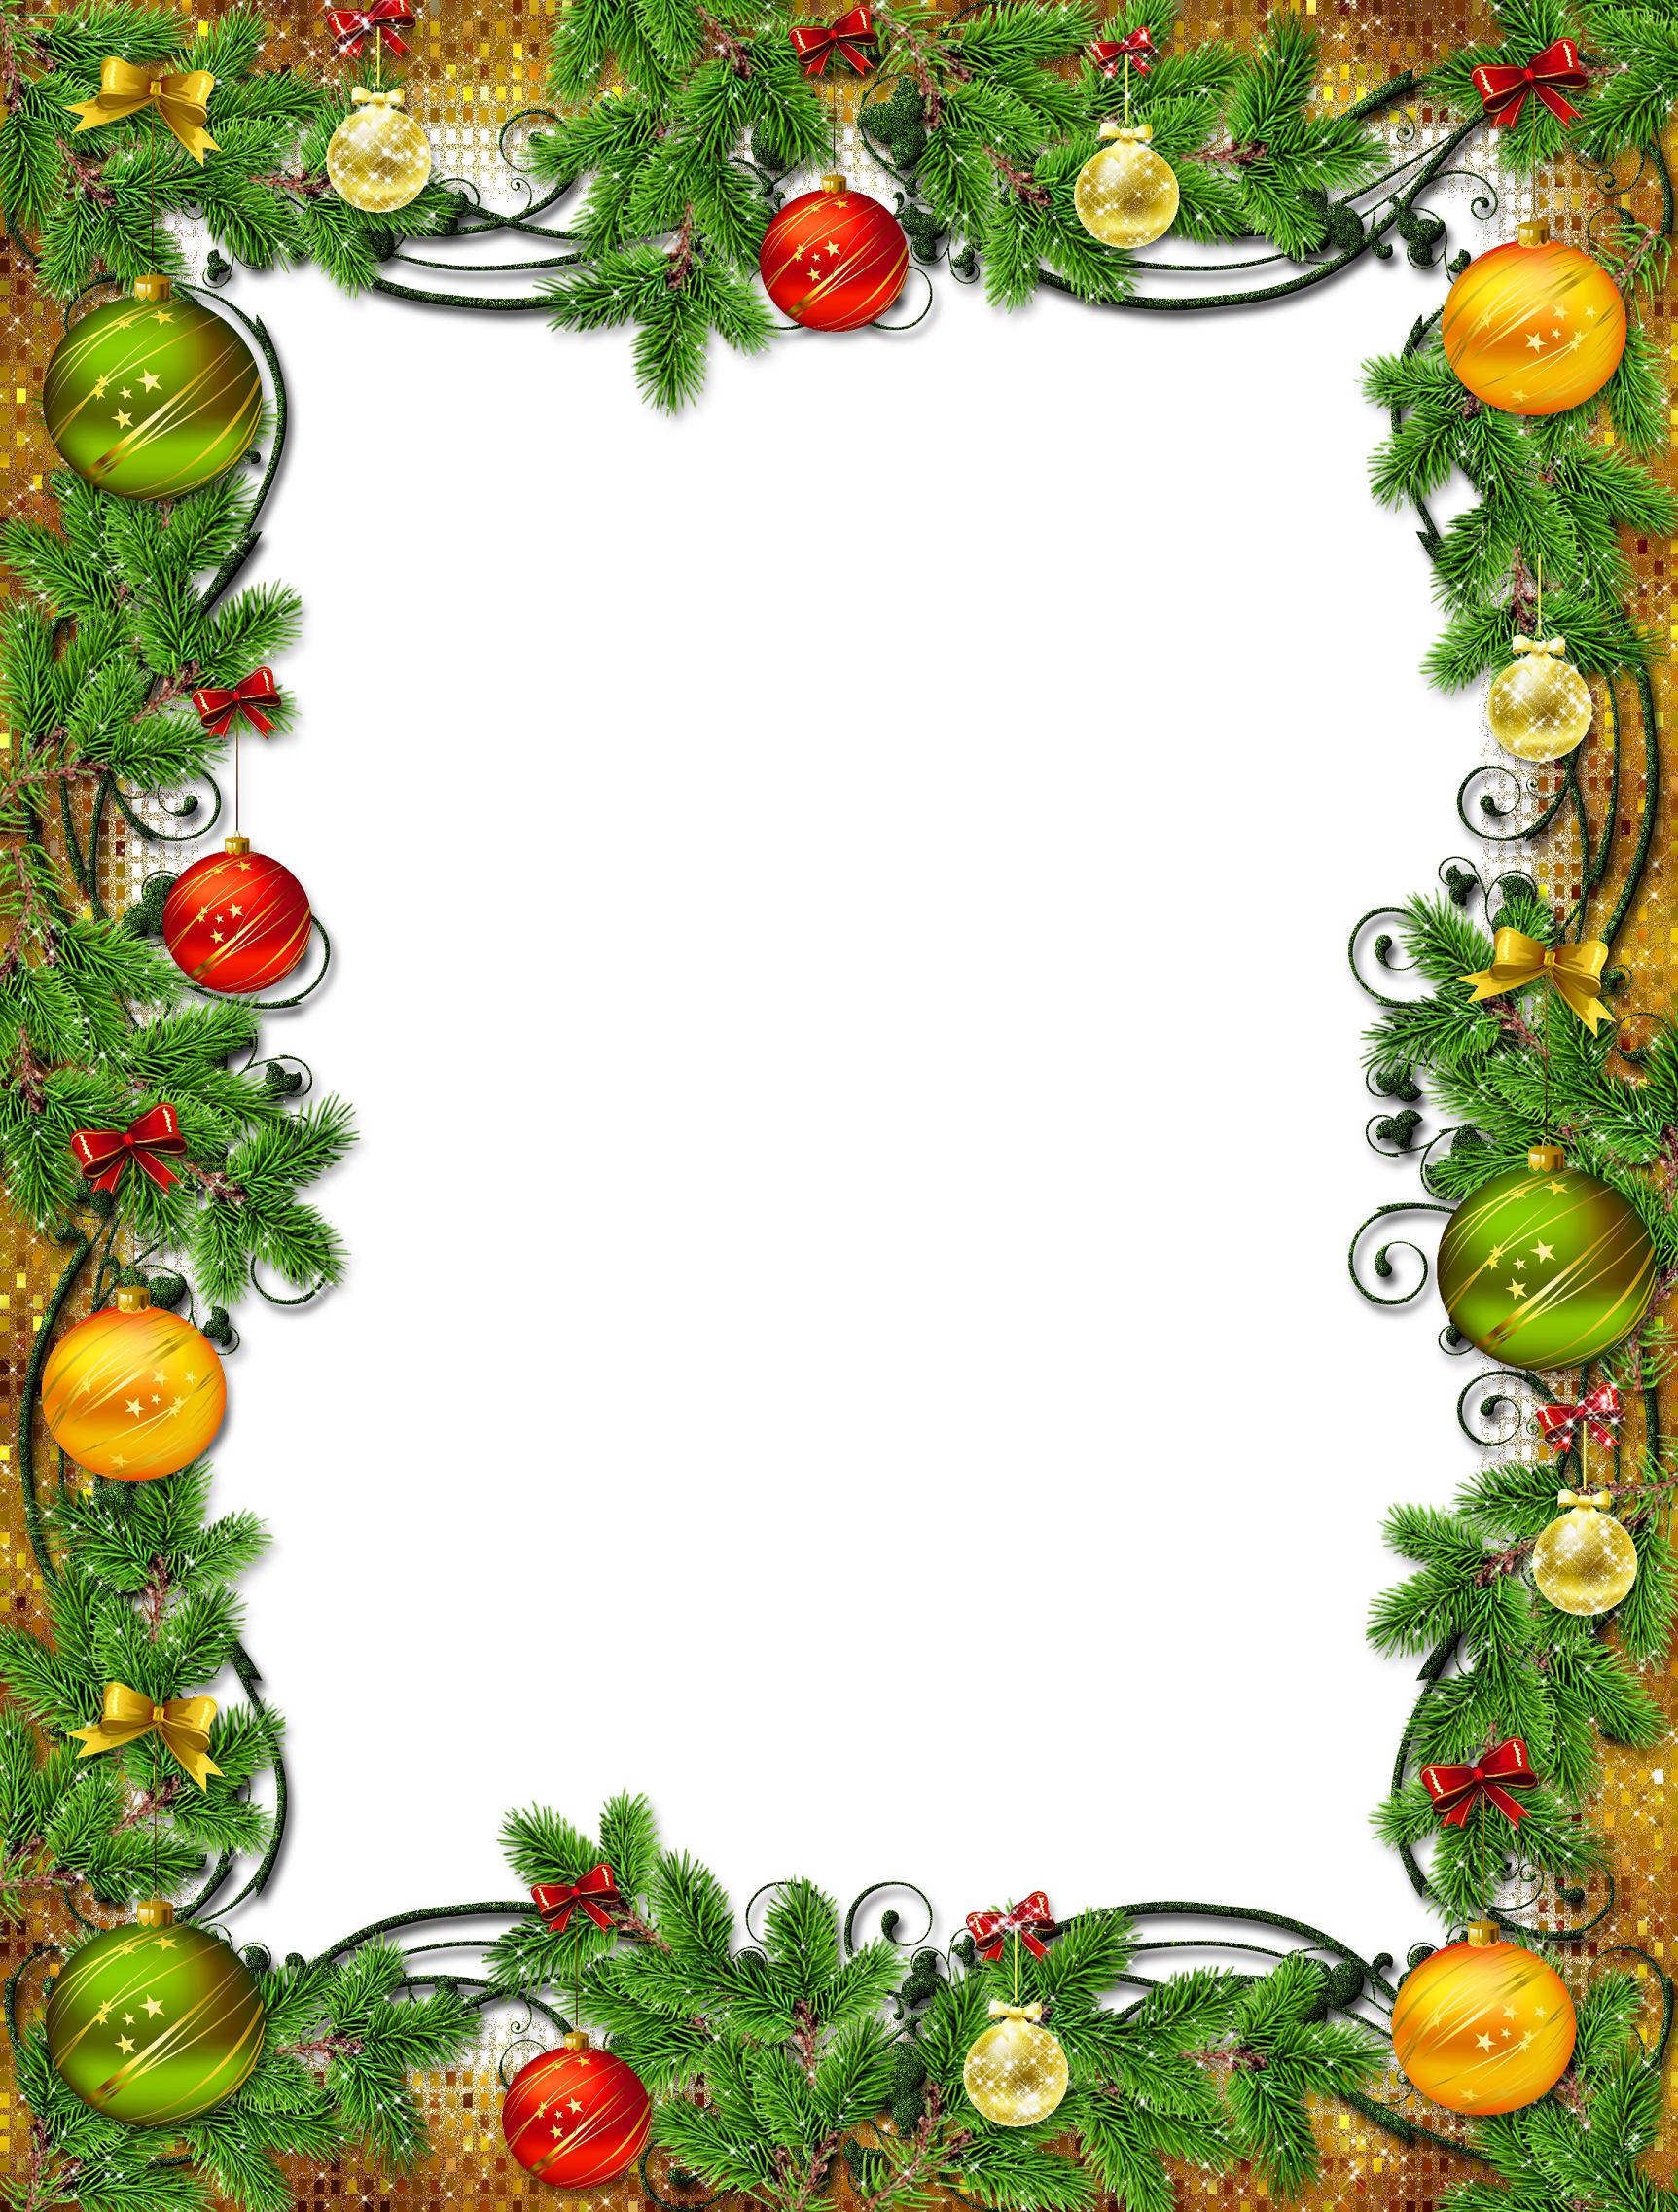 Xmas Picture Frame Ornaments | Framejdi.org